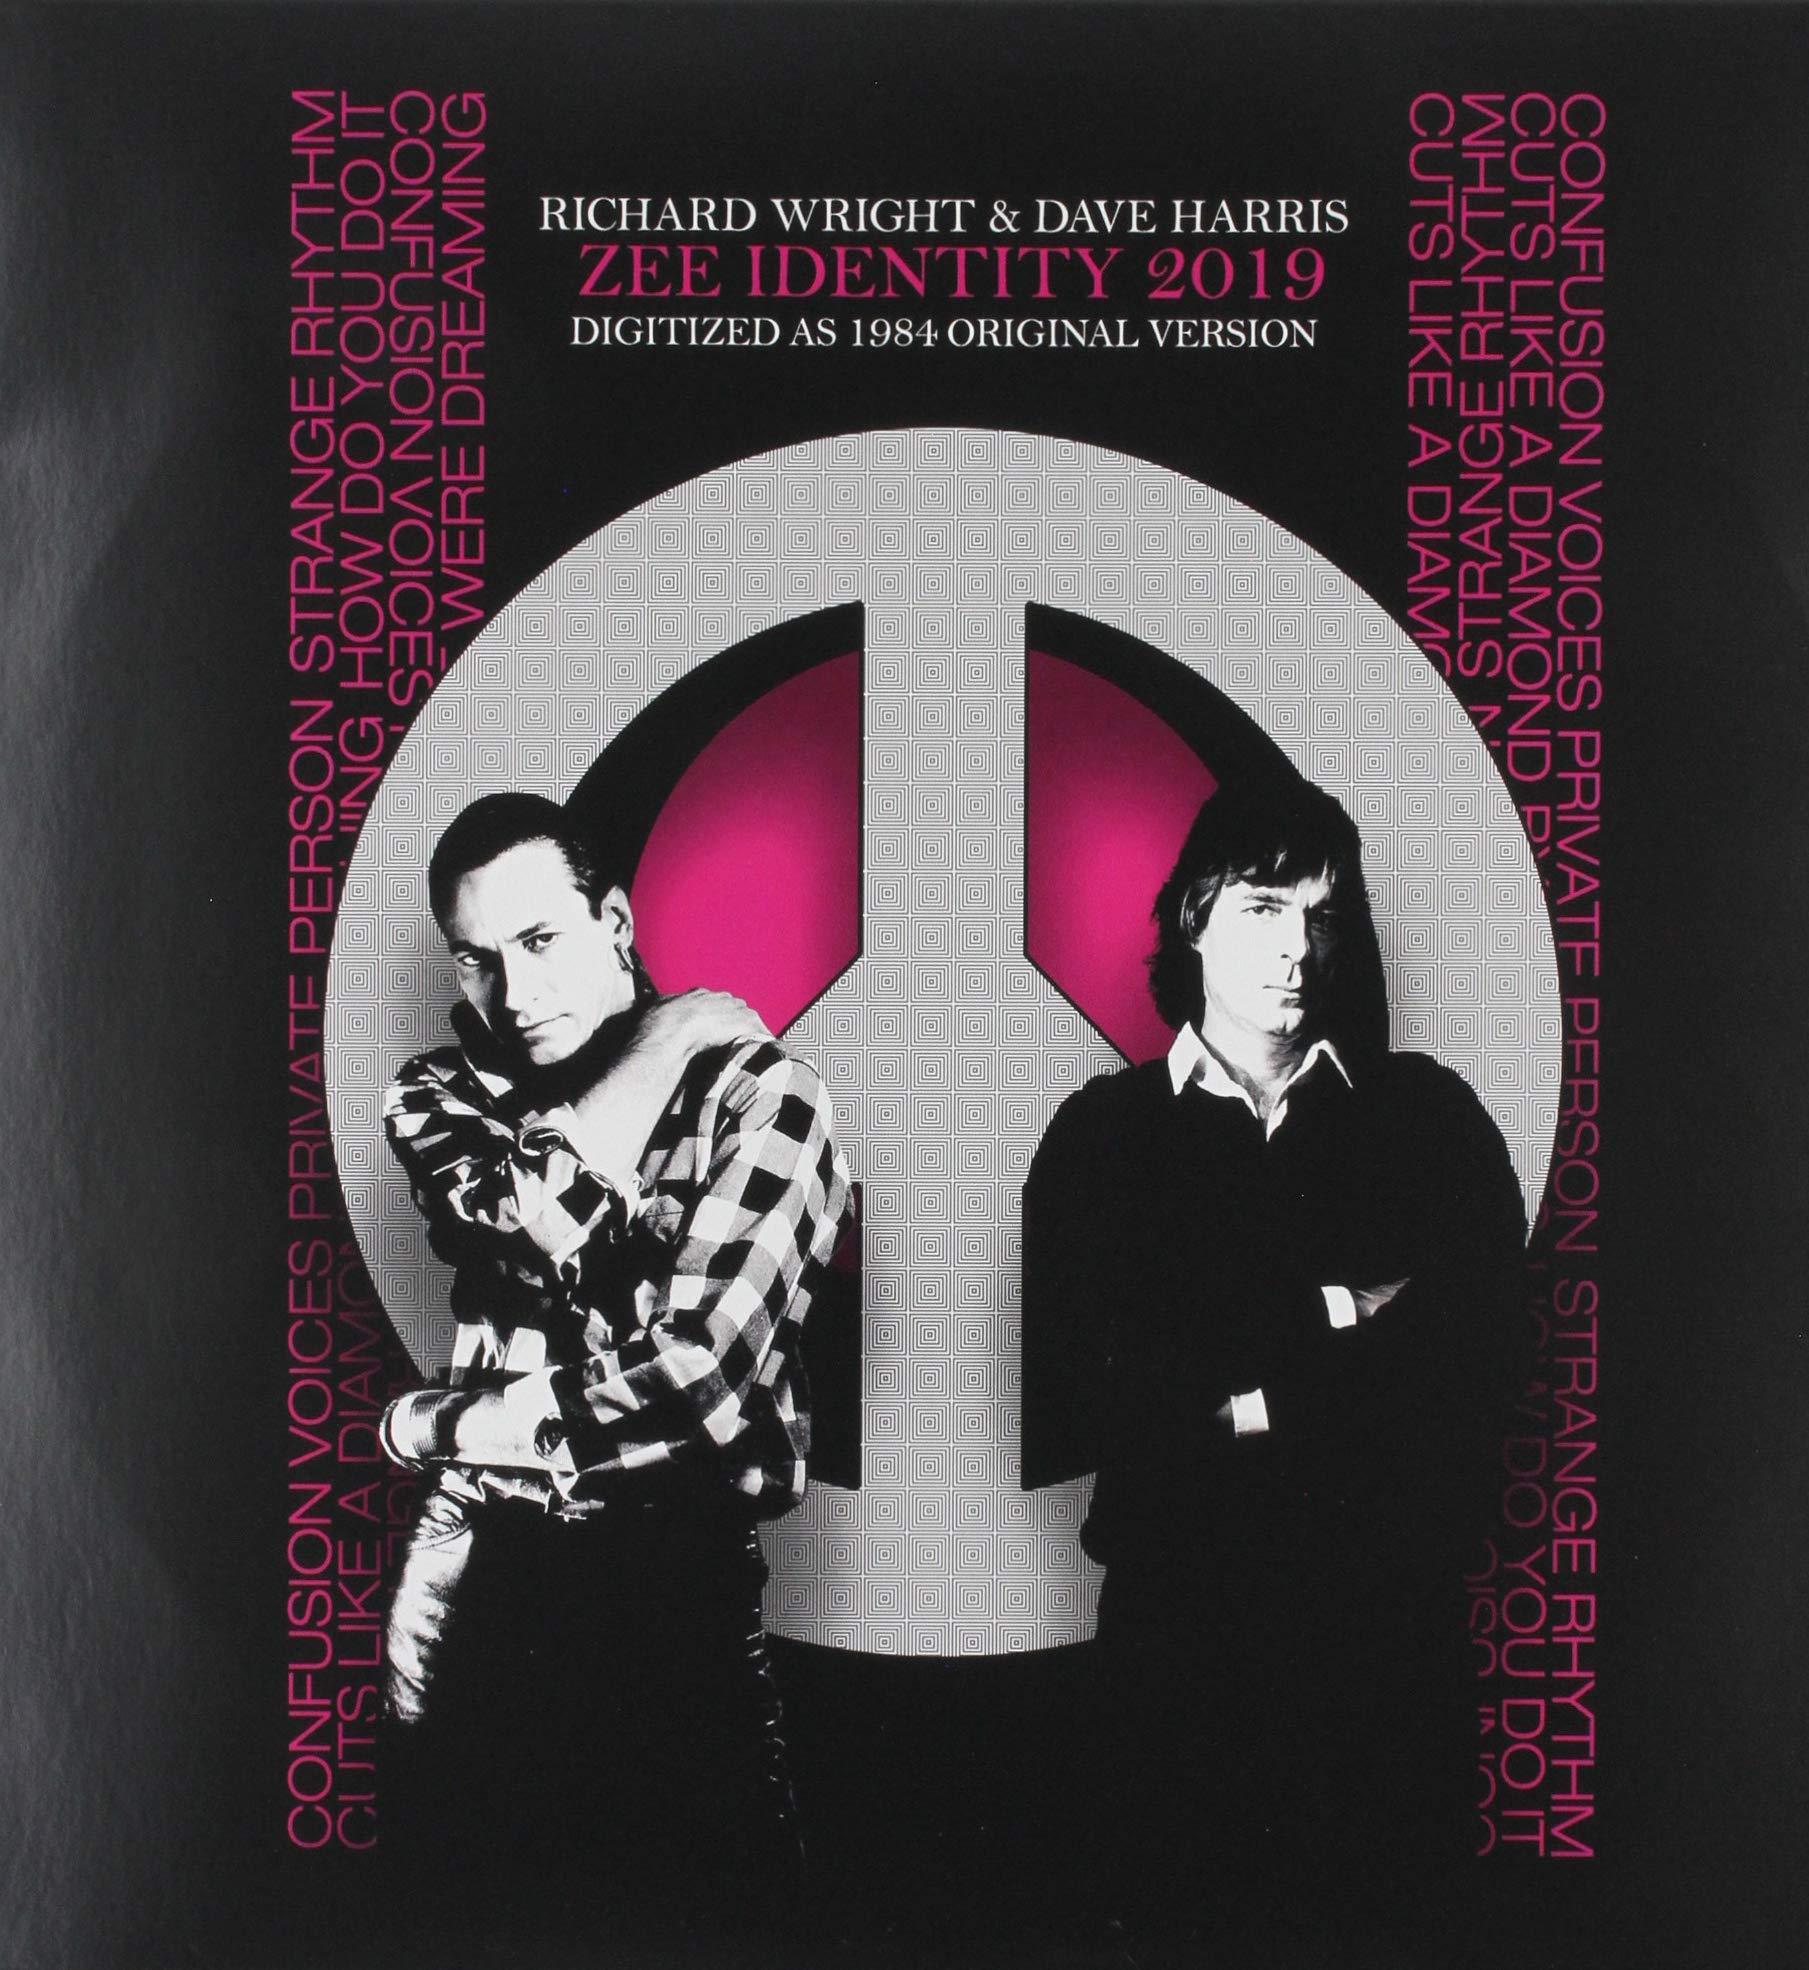 Richard Wright & Dave Harris – Zee Identity 2019 (2019) [FLAC]